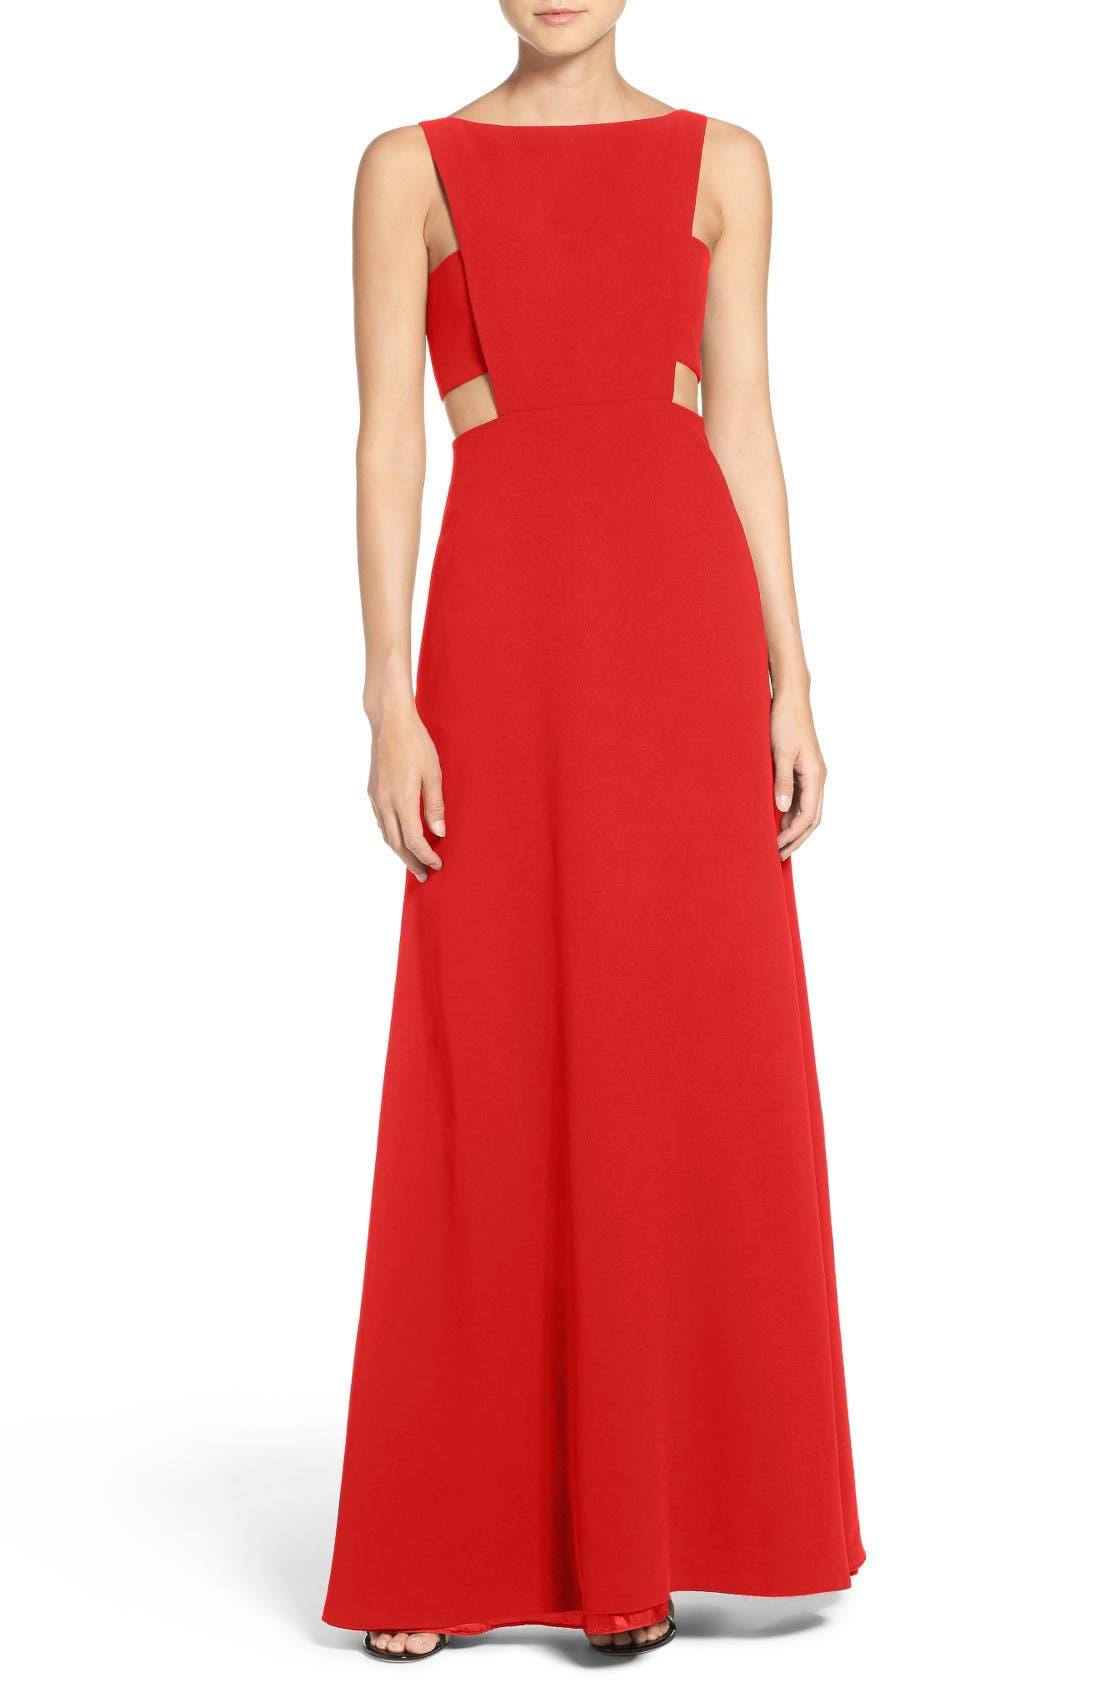 Jill Jill Stuart Cutout Crepe Gown